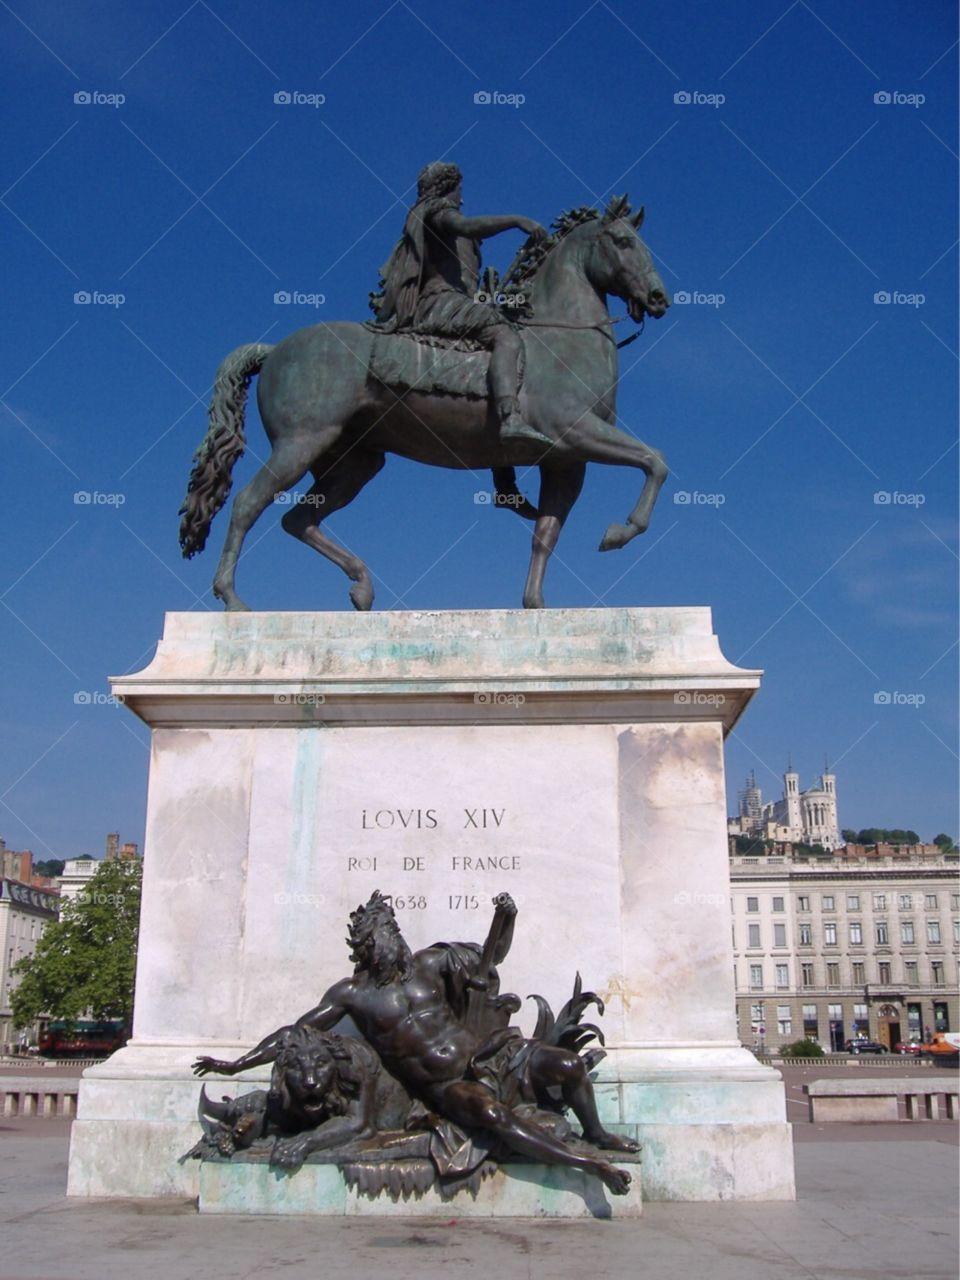 Statue of Louis XIV, Roi de France in a plaza. Lyon, France.